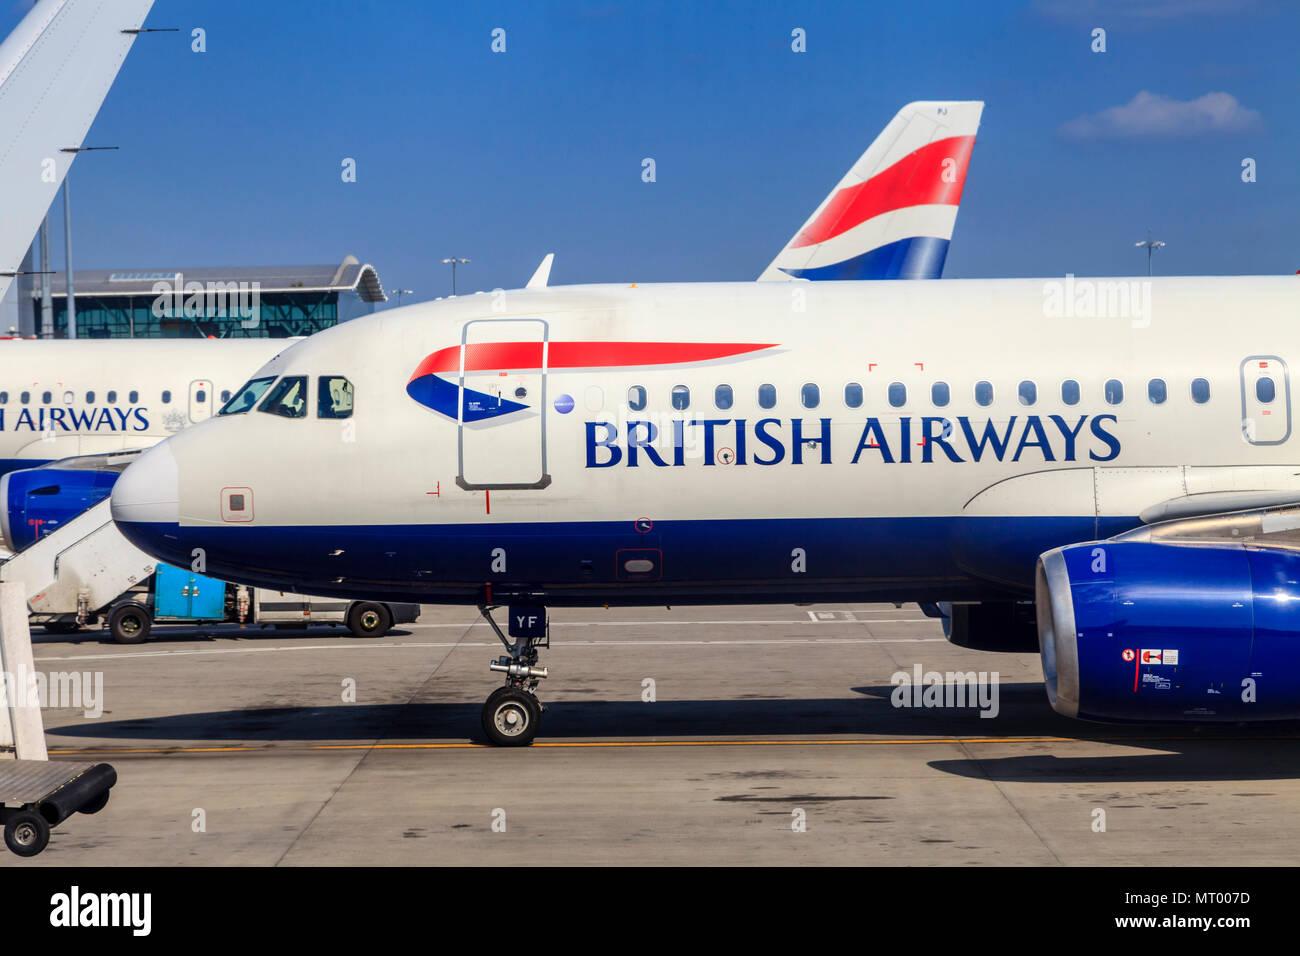 British Airways Planes At Heathrow Airport, London, UK - Stock Image